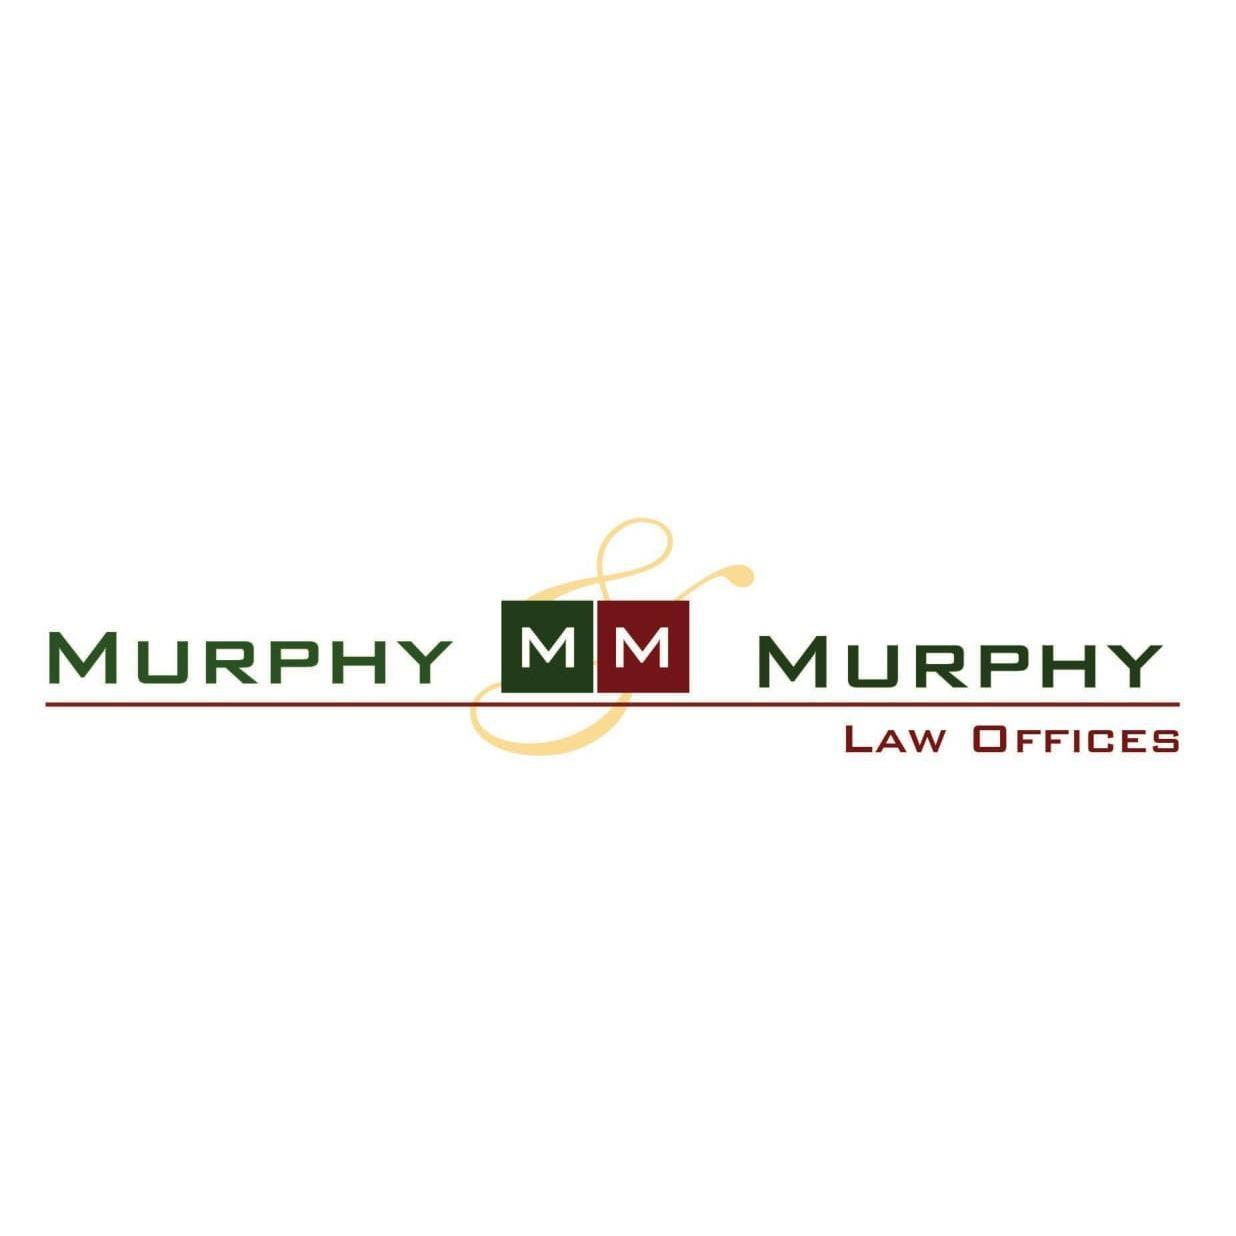 Murphy & Murphy Law Offices - Las Vegas, NV - Attorneys